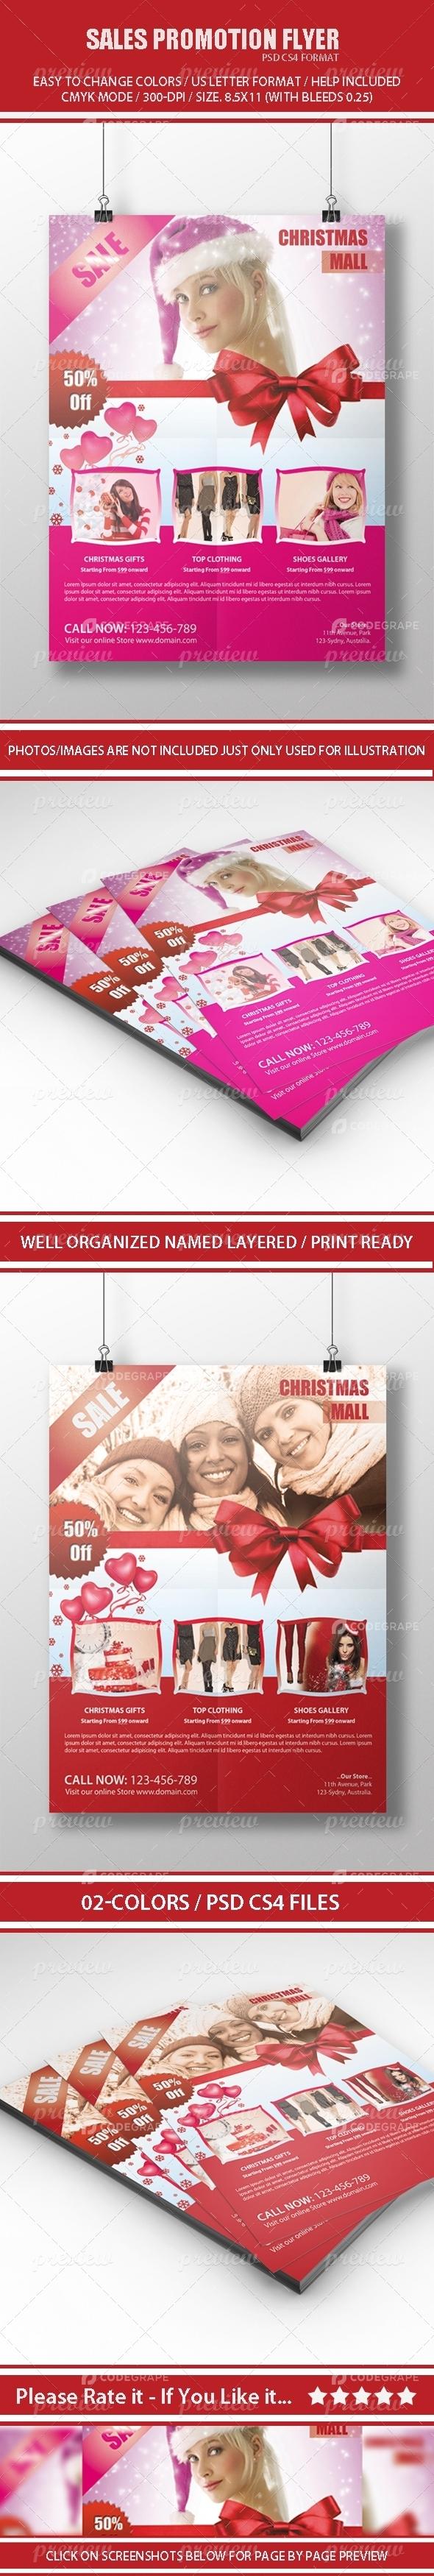 Sales Promotion Flyer